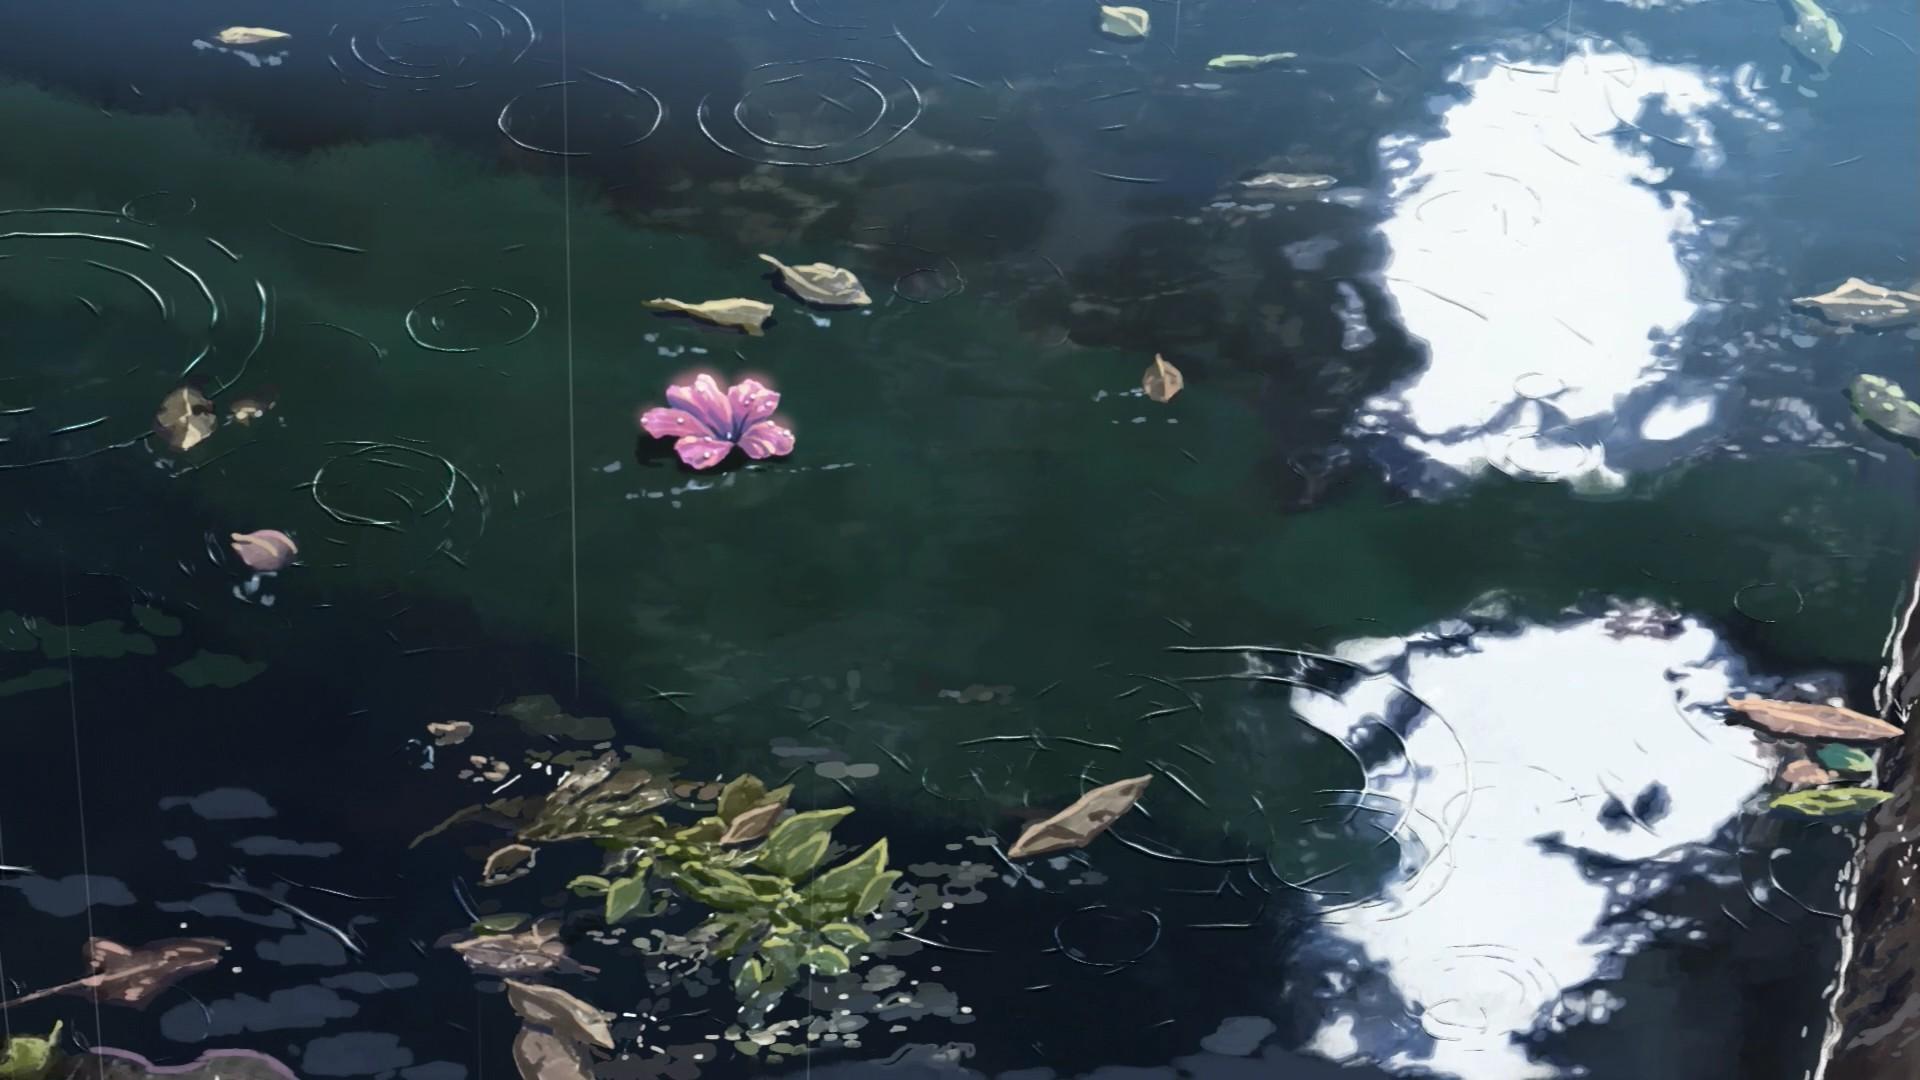 Wallpaper : 1920x1080 Px, Flowers, Makoto Shinkai, Rain